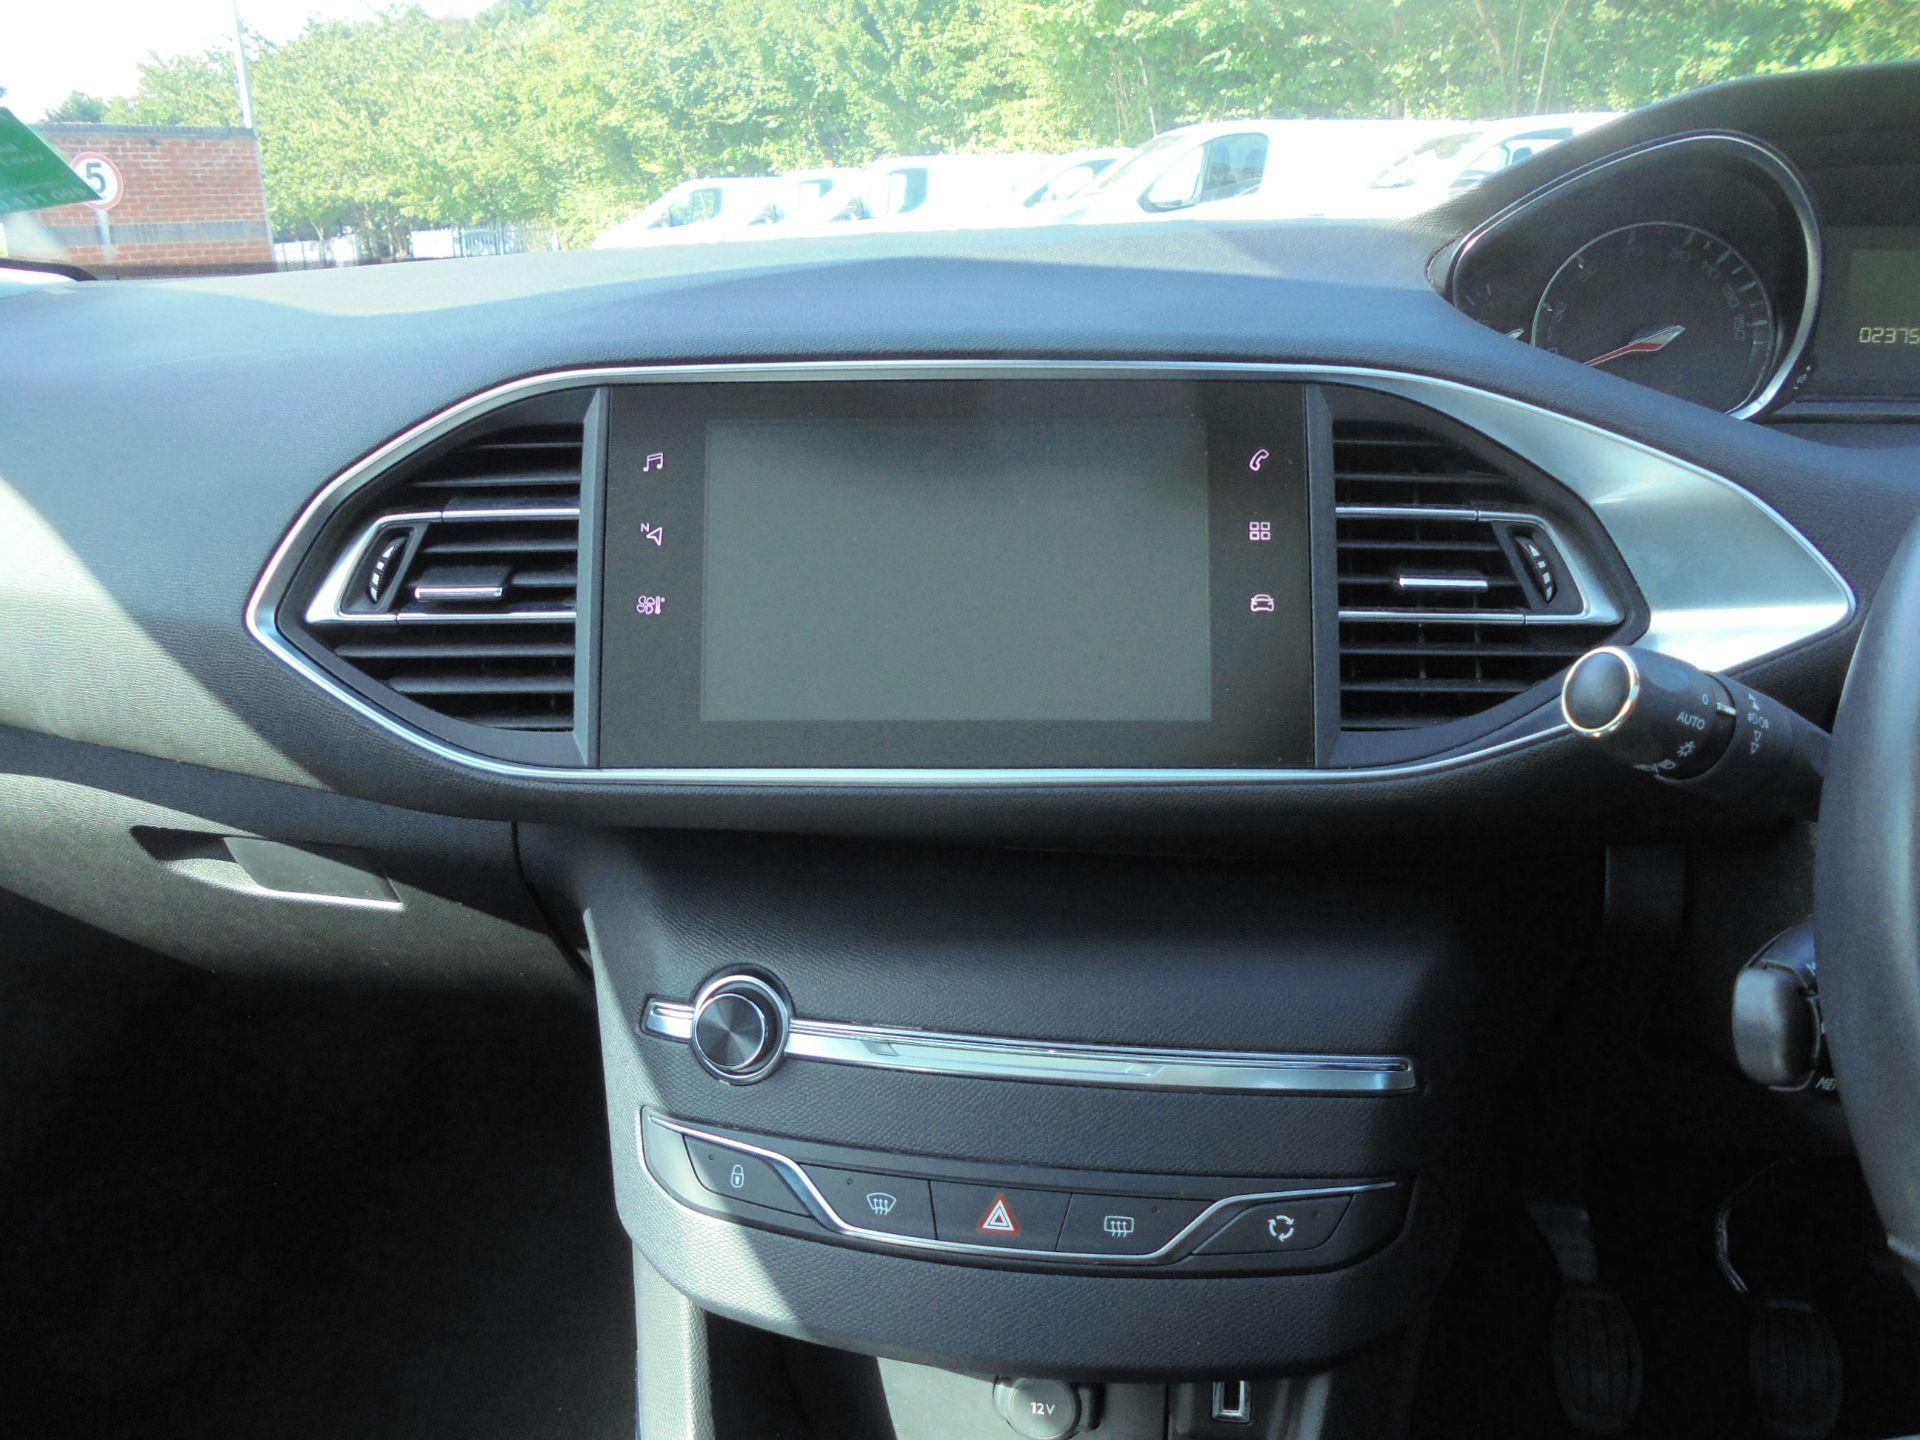 2018 Peugeot 308 1.5 Bluehdi 130 Allure 5Dr (NV18ZWP) Image 14